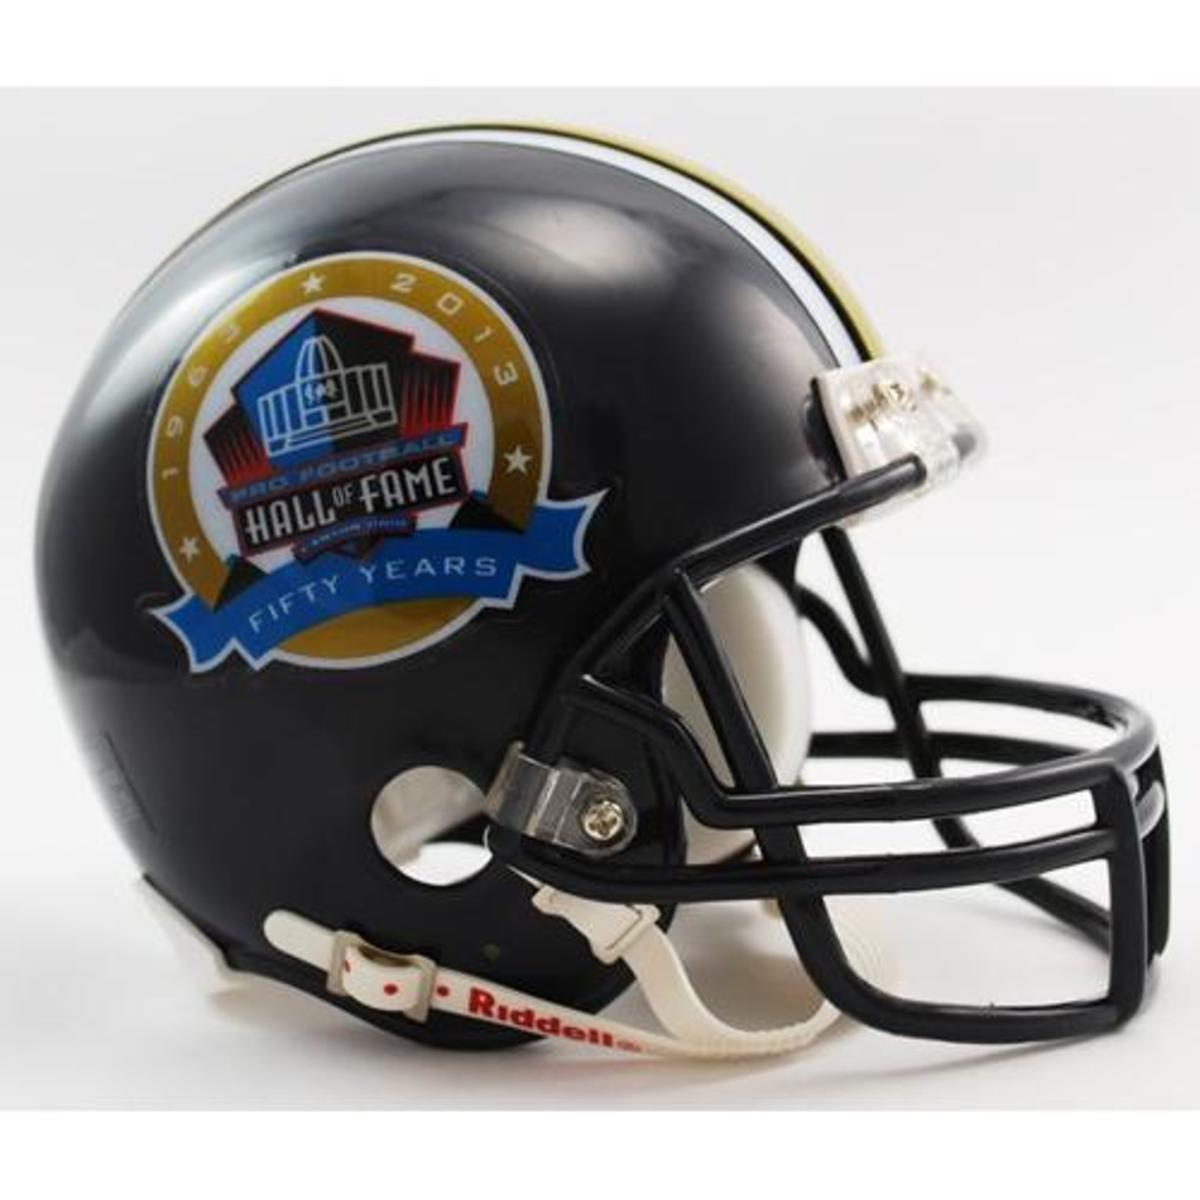 50th_Anniversary_Helmet1